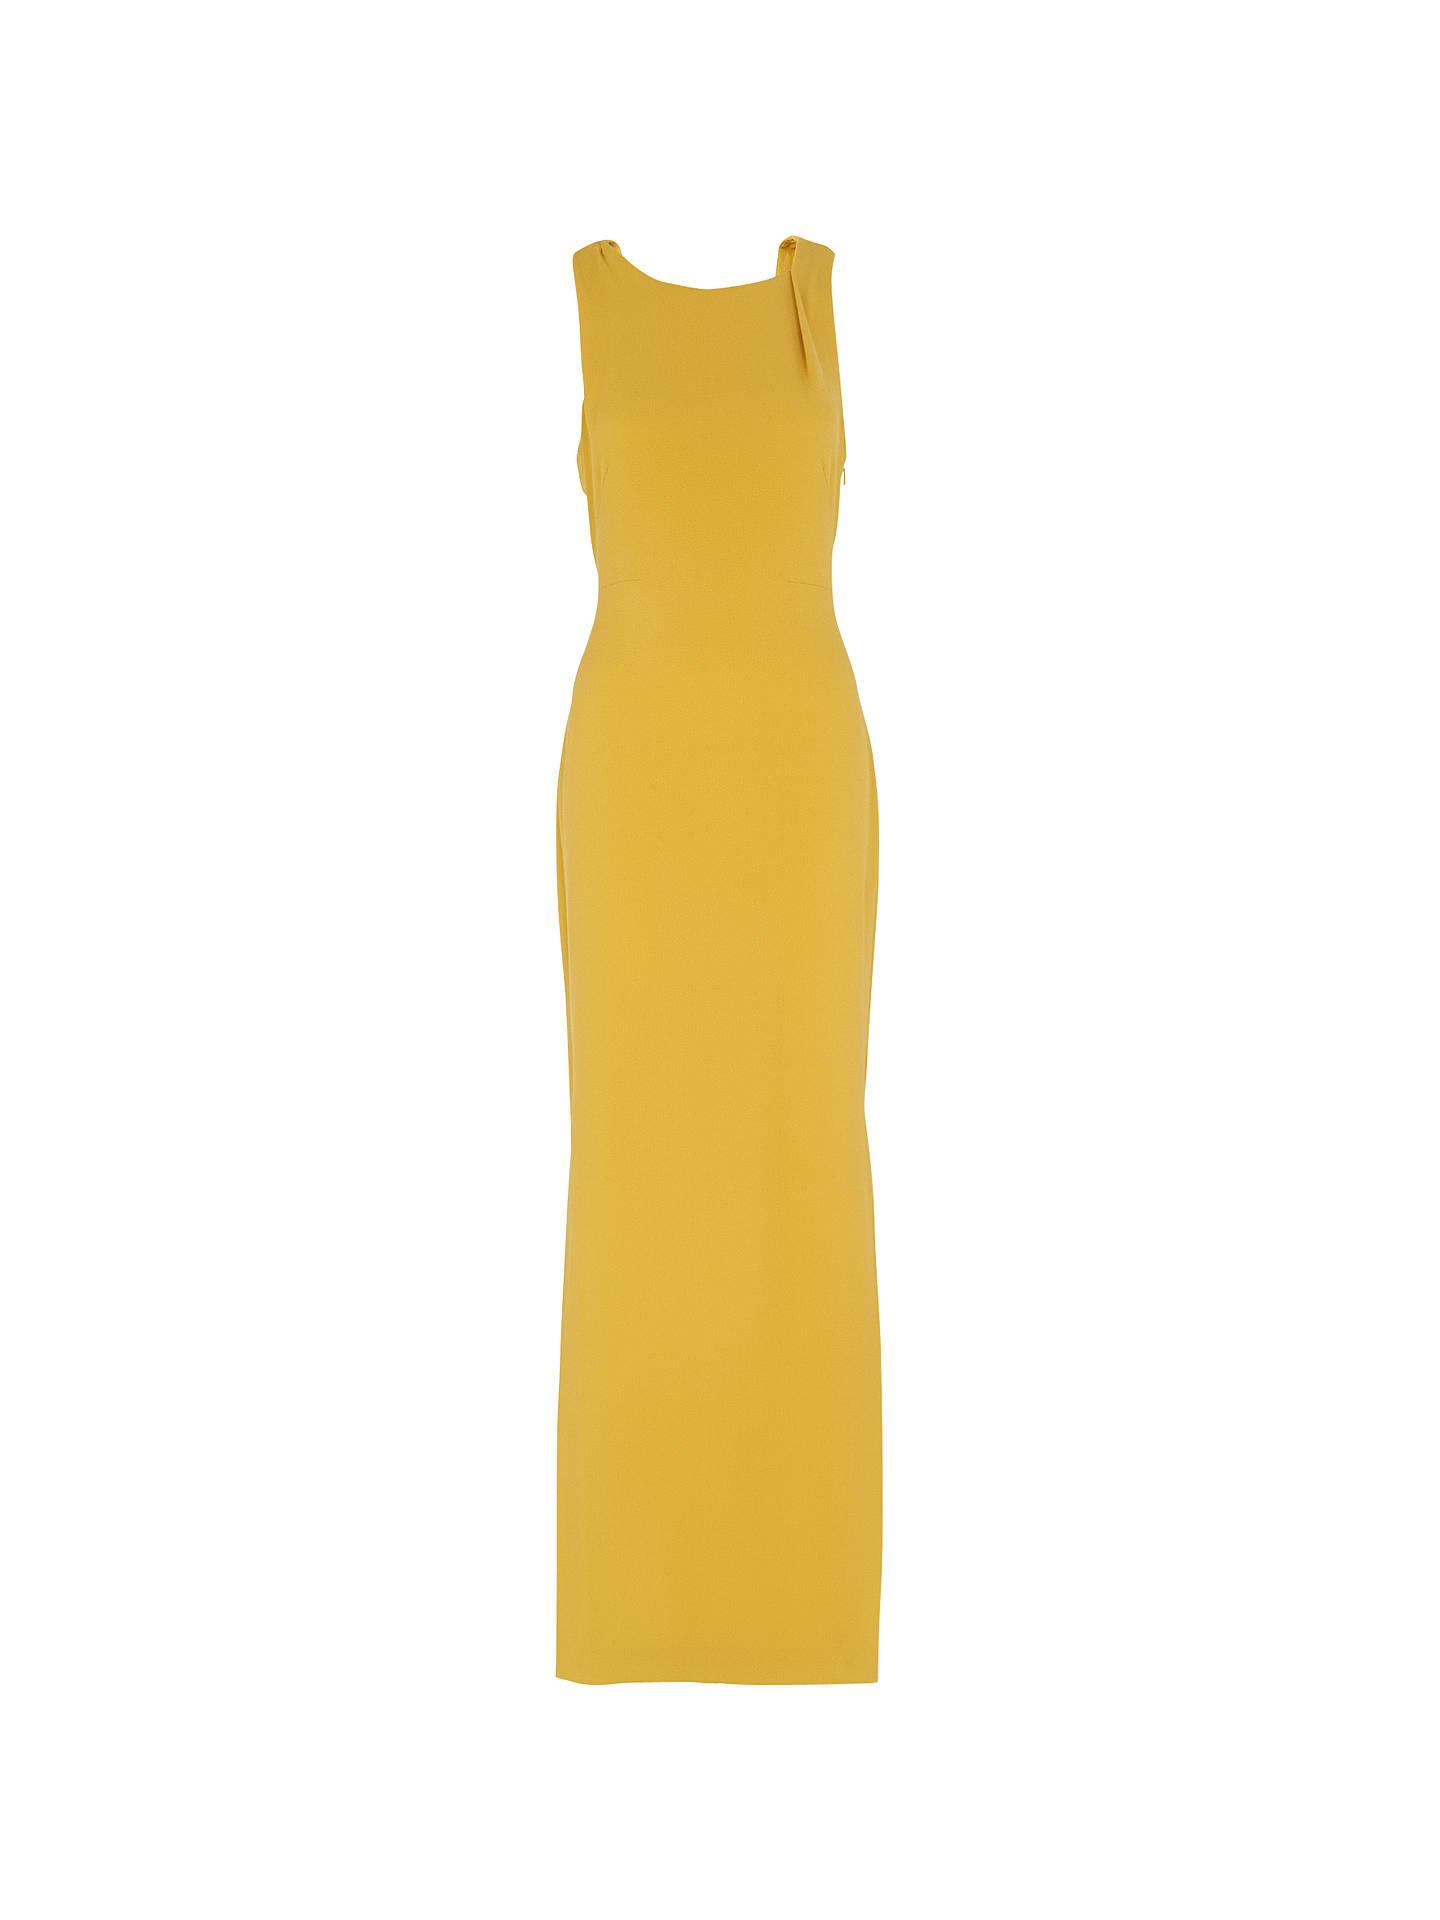 5fda380c4d8c Buy Whistles Tie Back Maxi Dress, Yellow, 6 Online at johnlewis.com ...